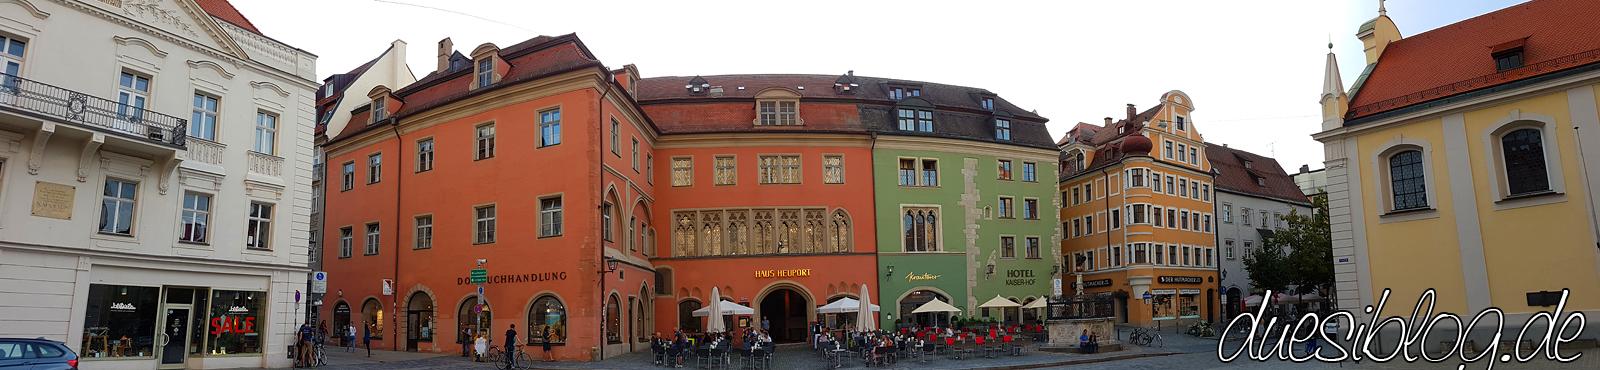 Regensburg old town Travelblog duesiblog 38